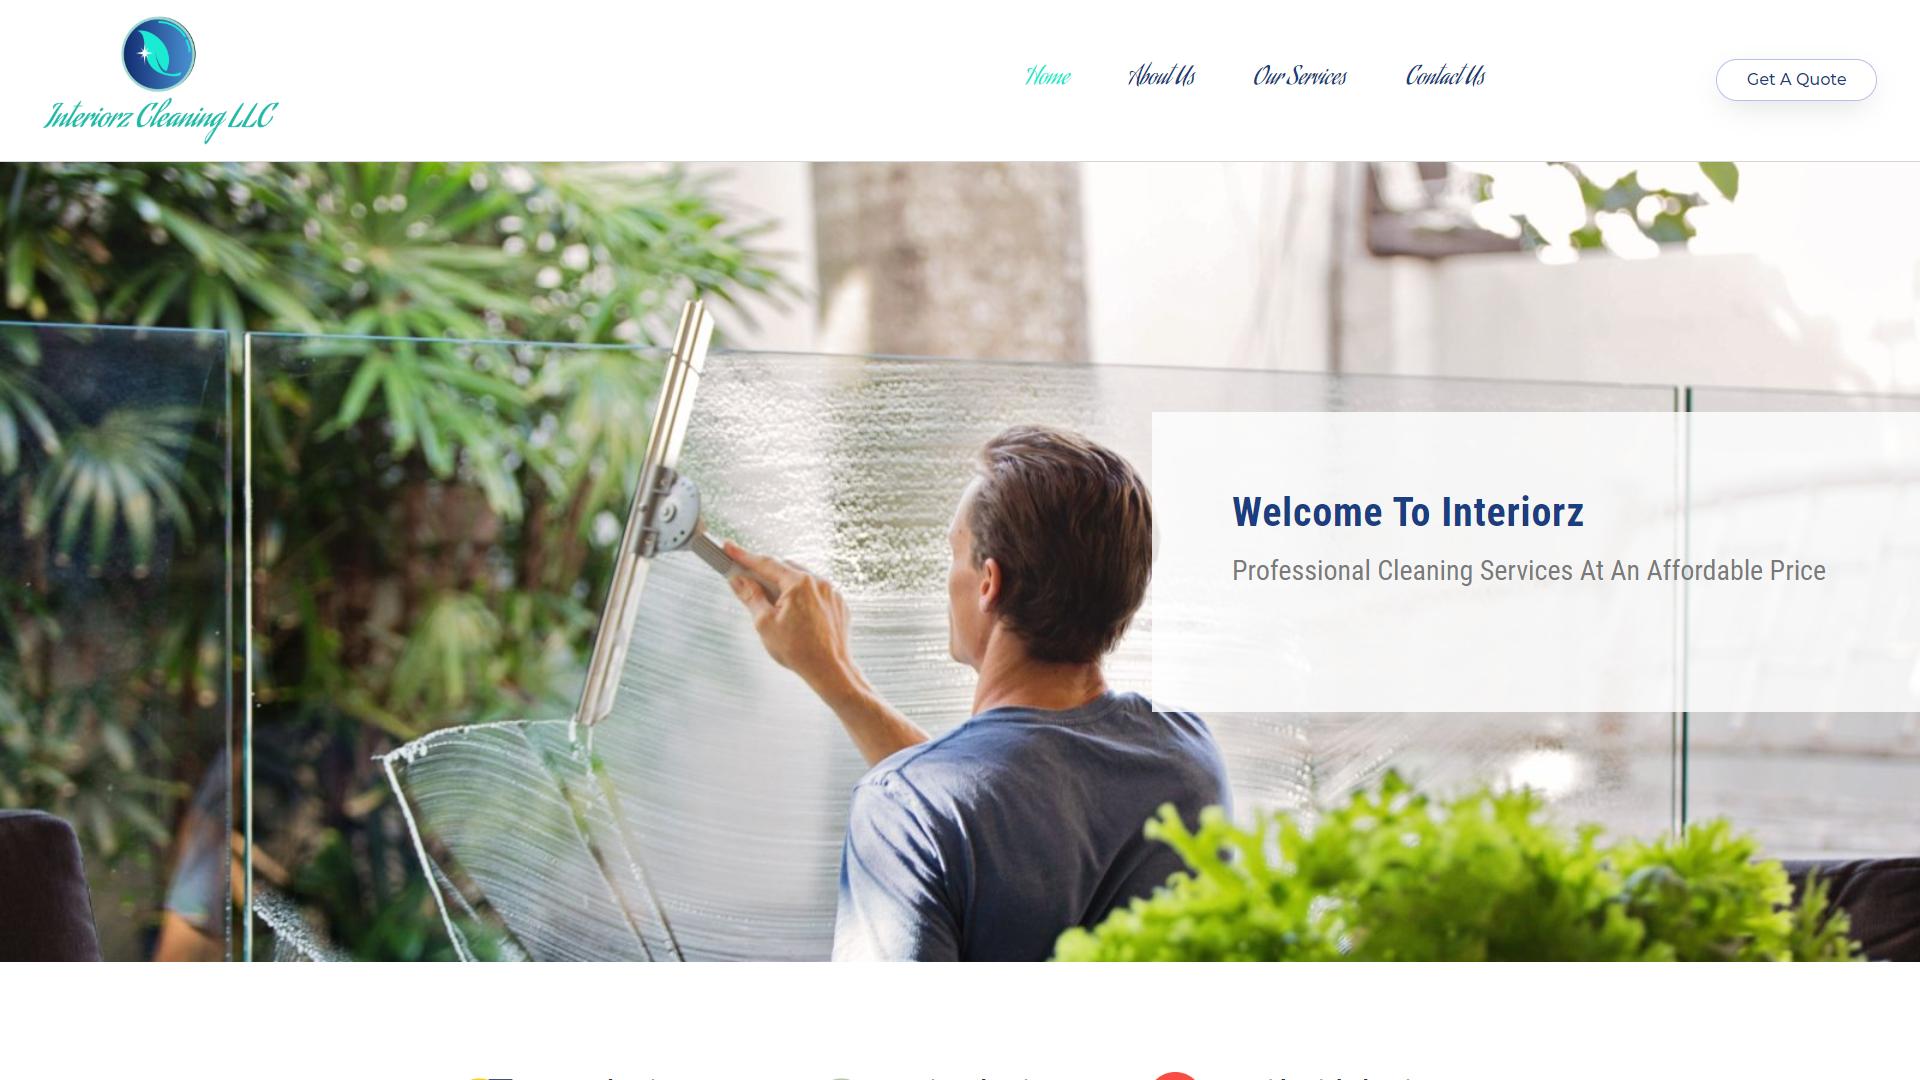 Interiorz Cleaning LLC